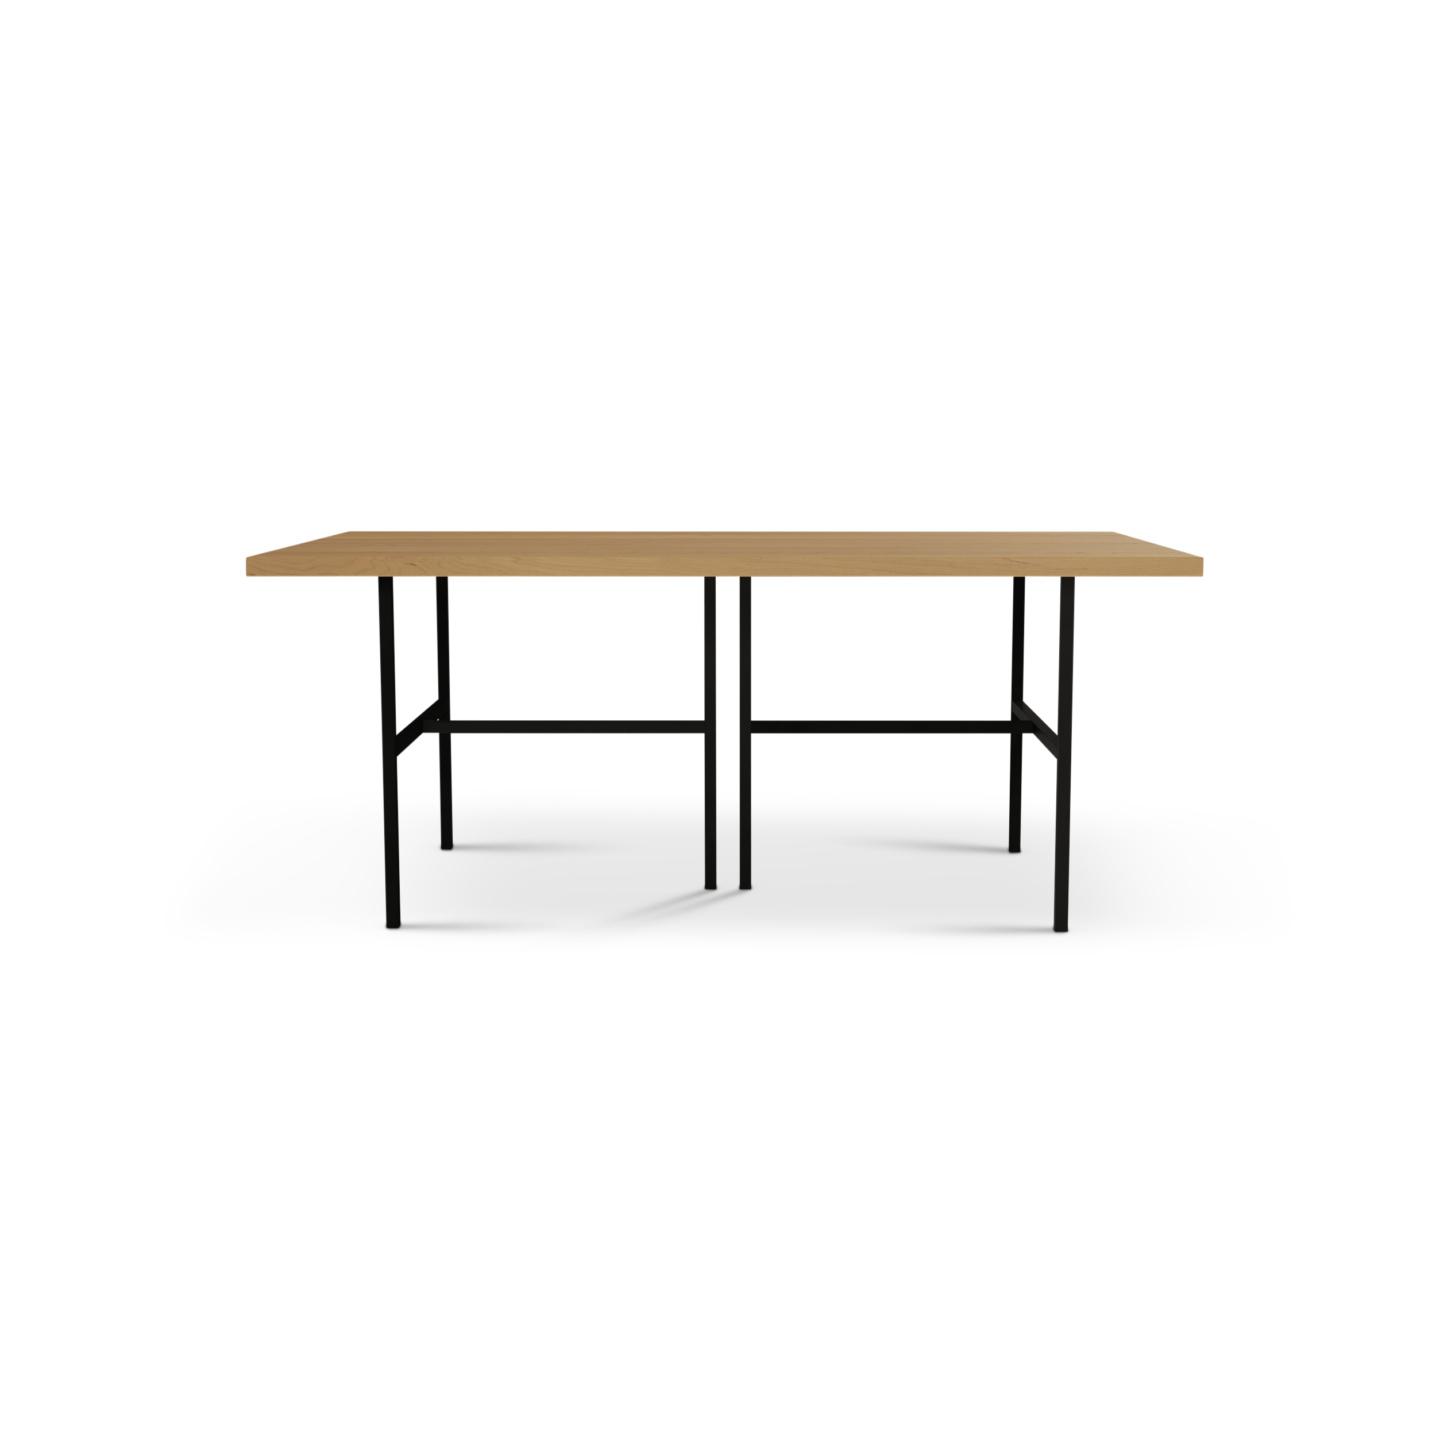 Six foot modern cherry dining room table on black metal legs